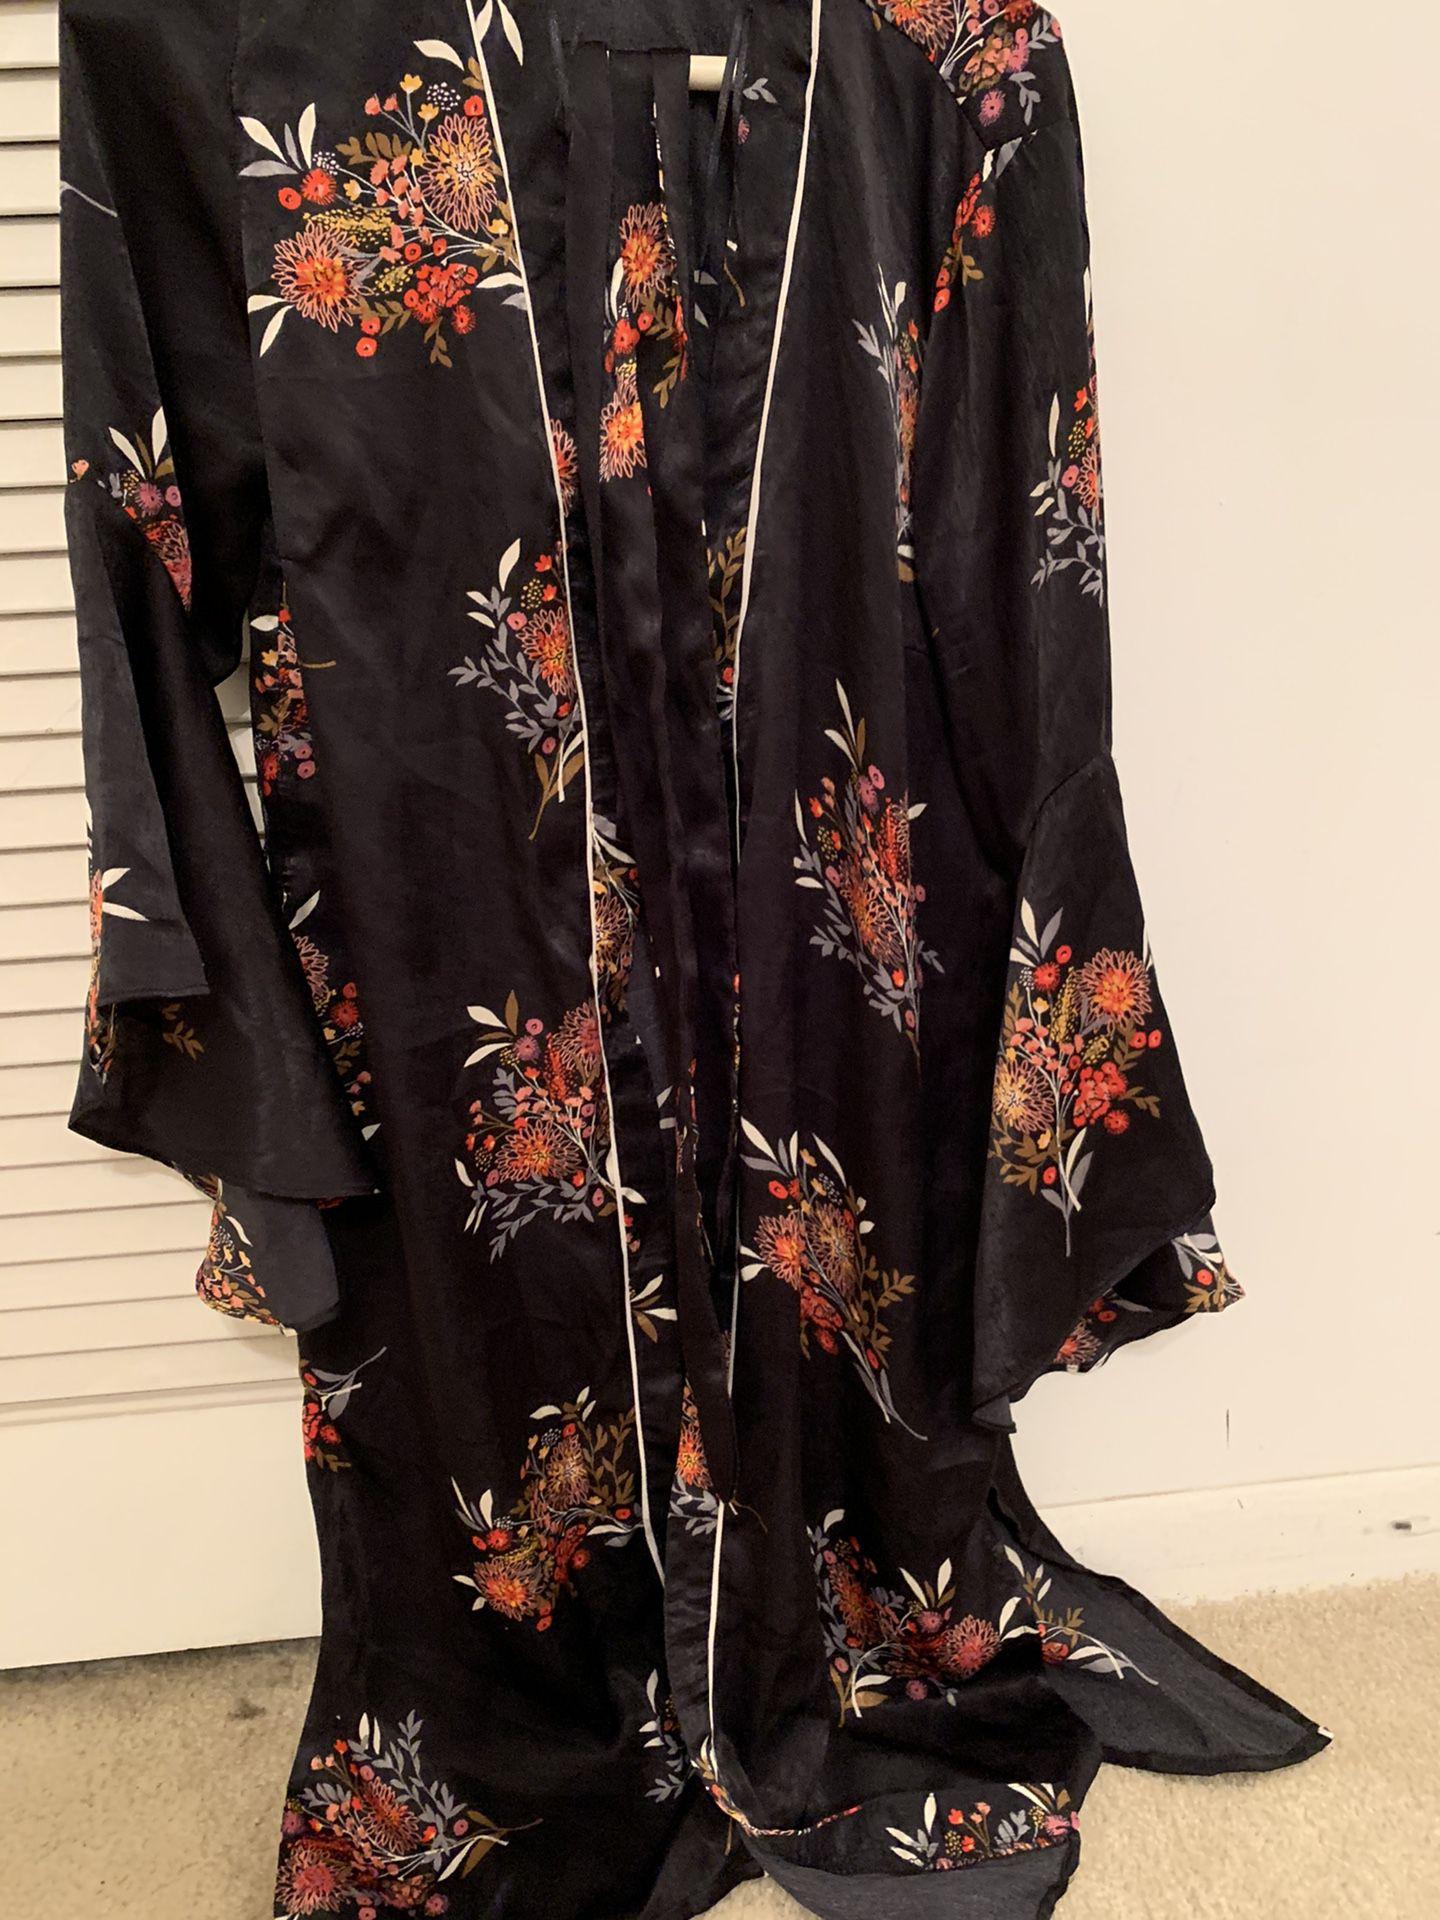 Brand new size 4 night wear